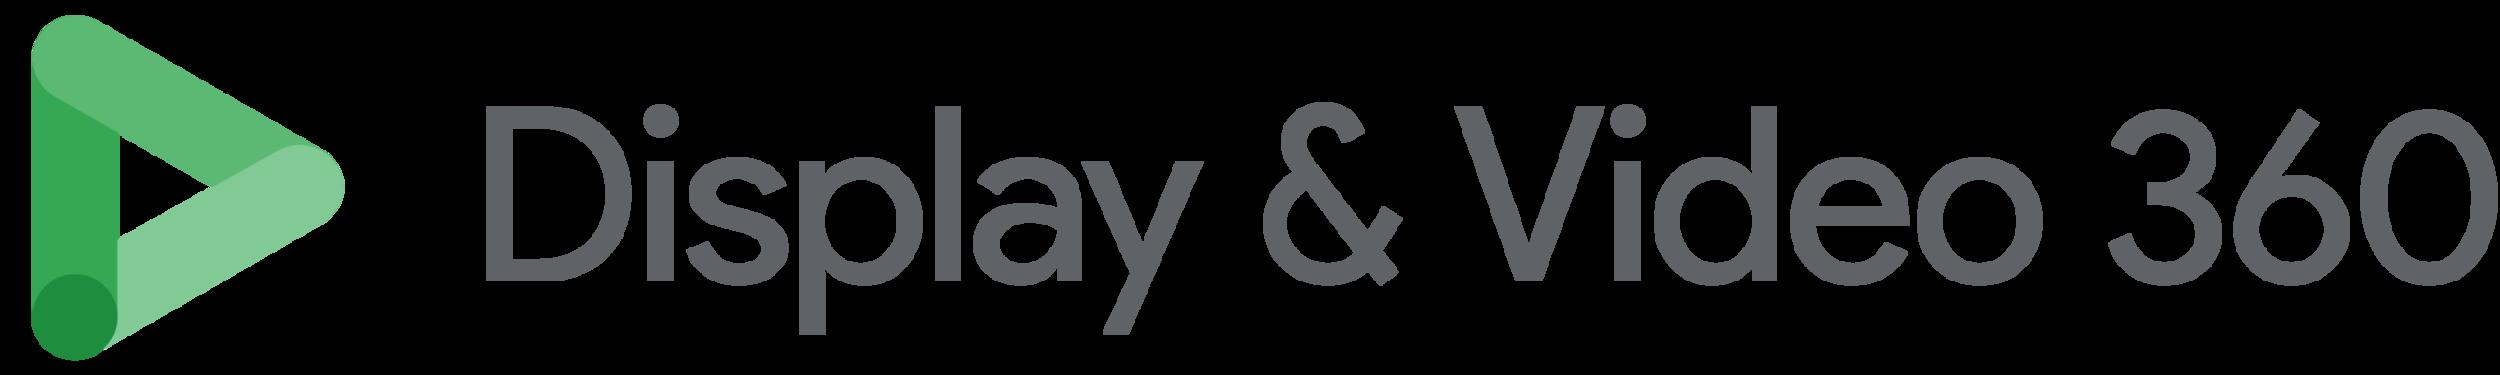 logo-dv360.png